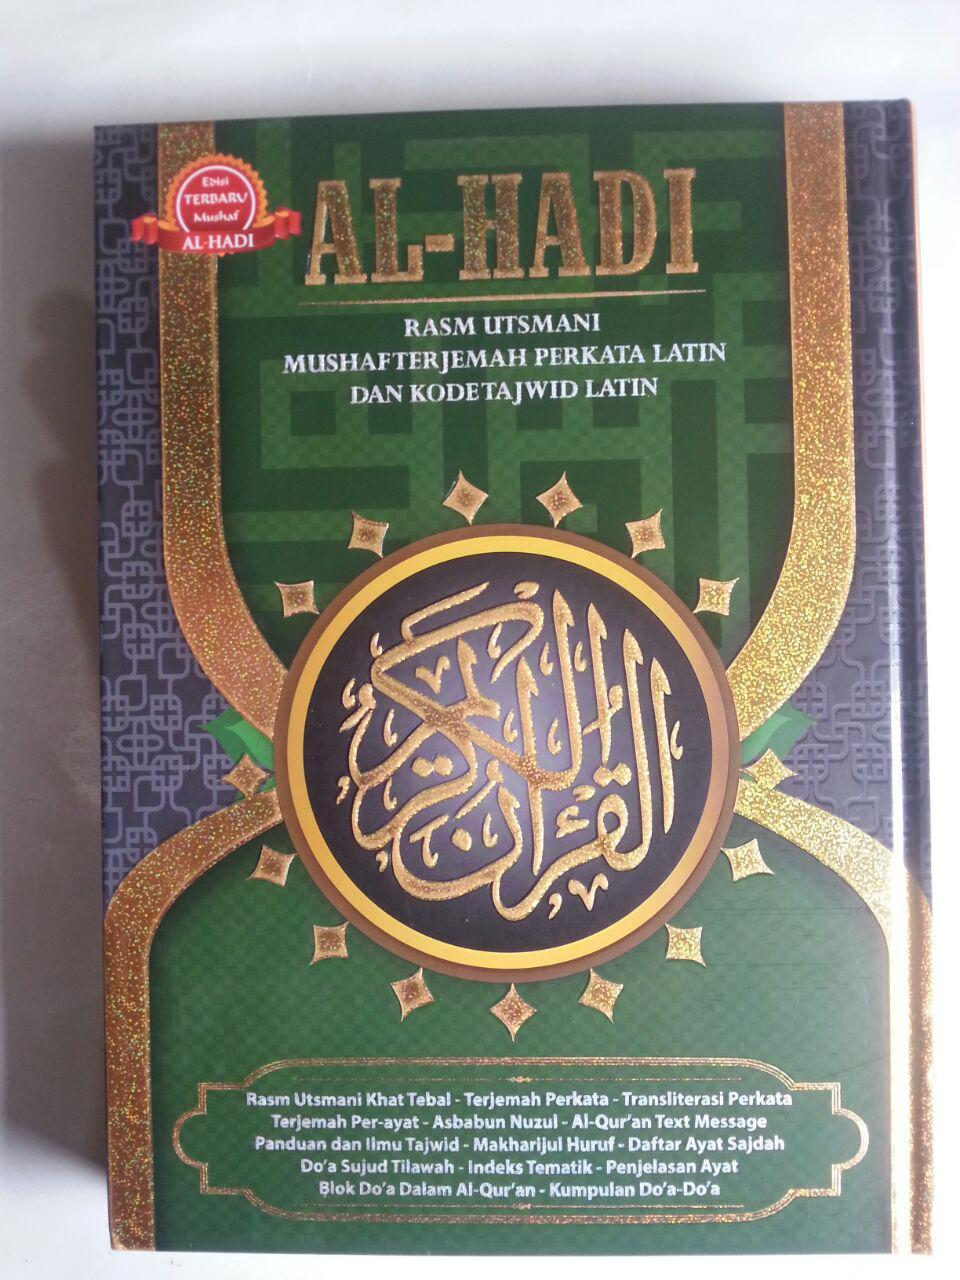 Al-Qur'an Al-Hadi Rasm Utsmani Mushaf Terjemah Perkata Tajwid A4 cover